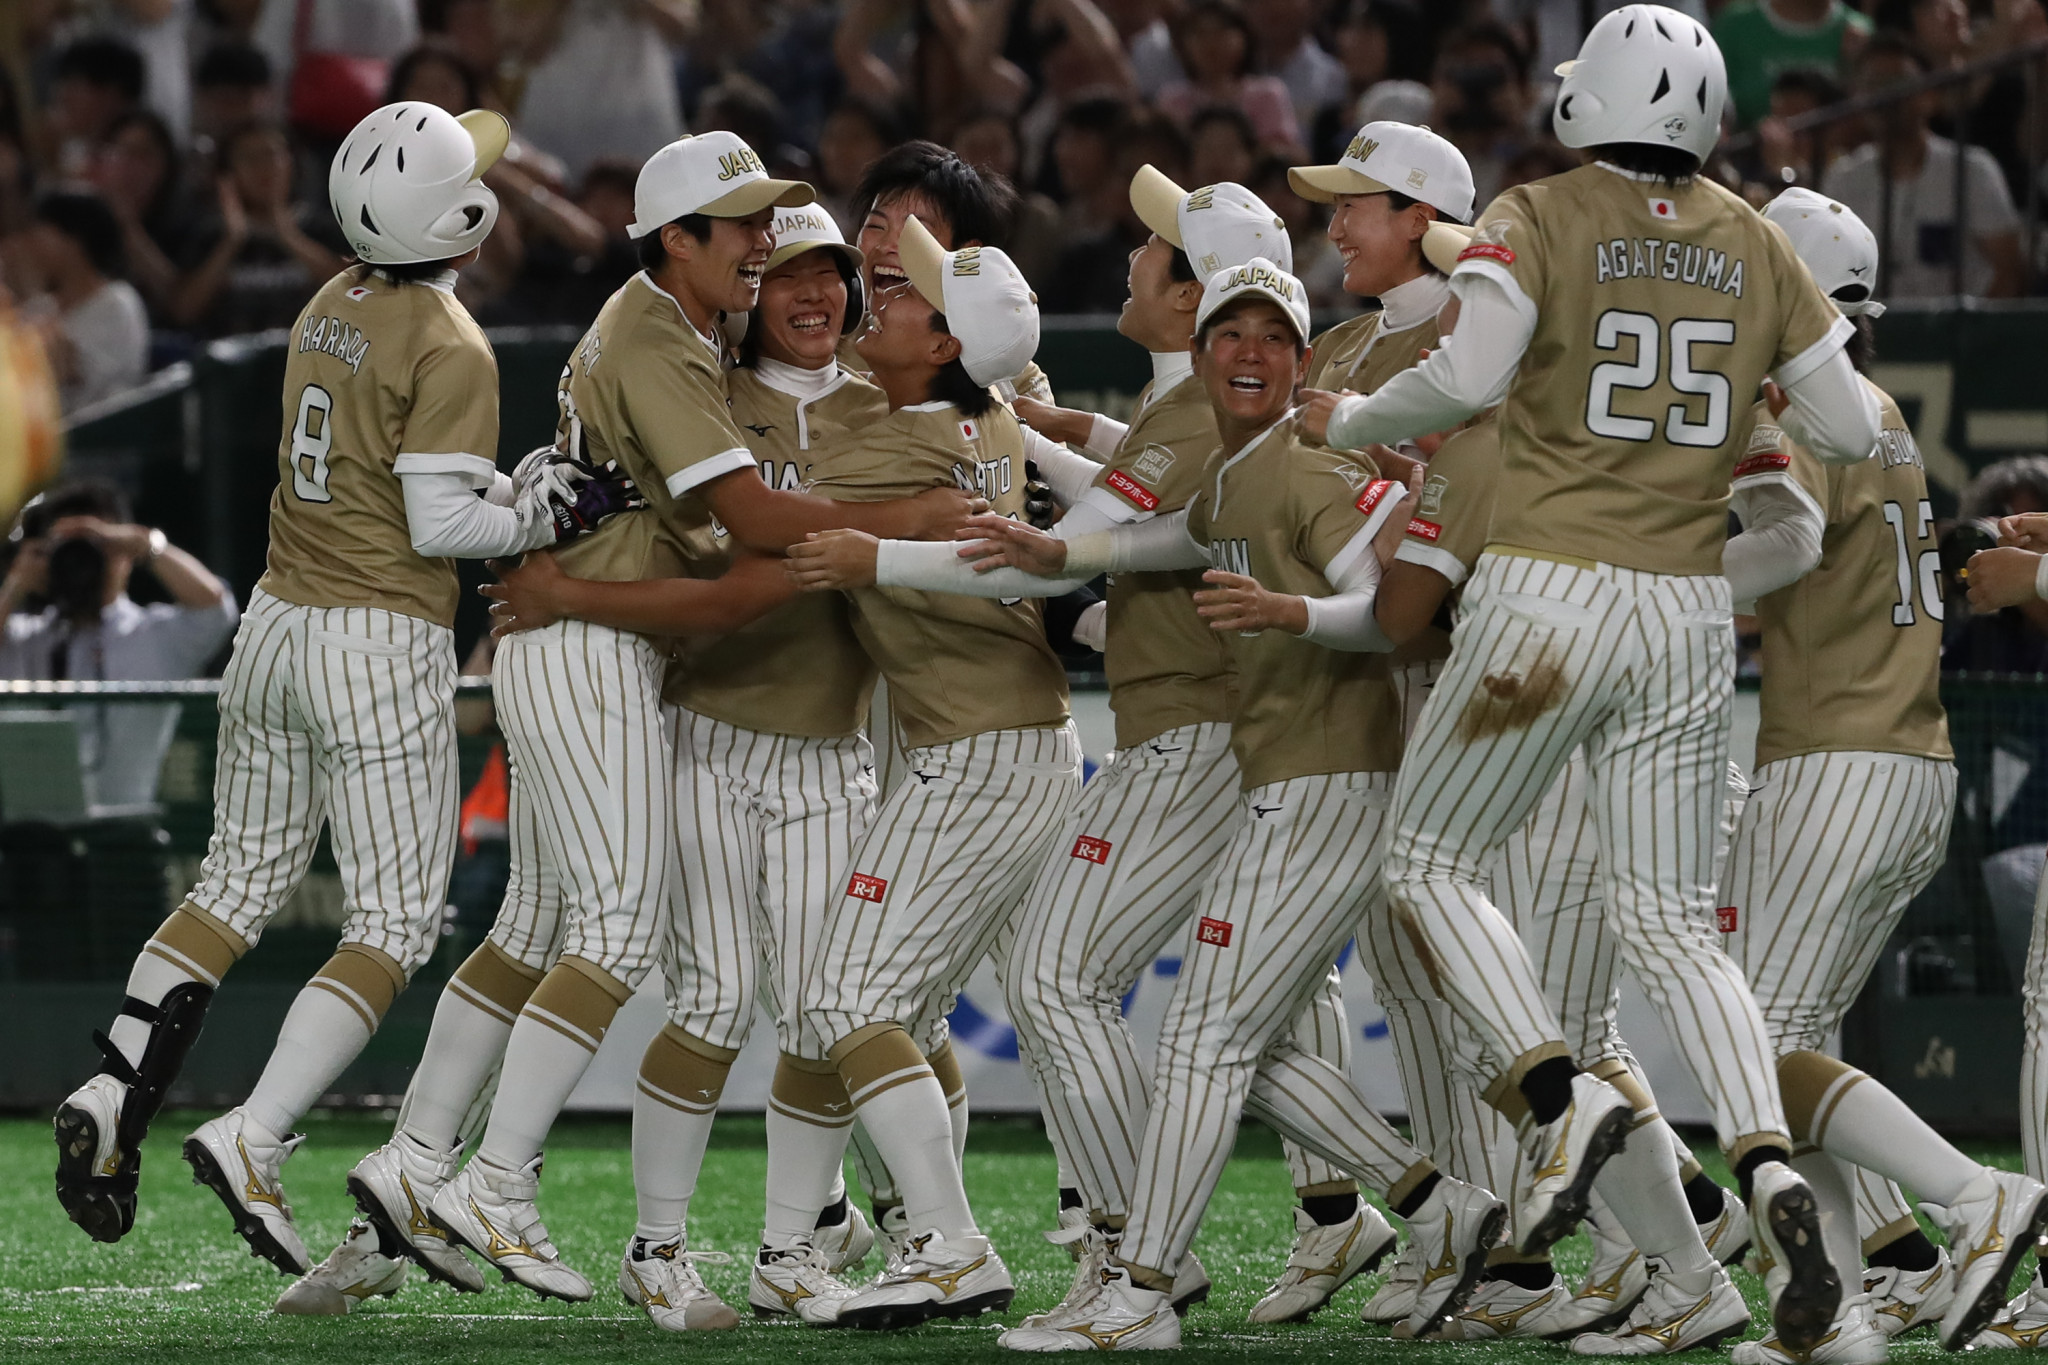 Japan set to name Tokyo 2020 softball squad